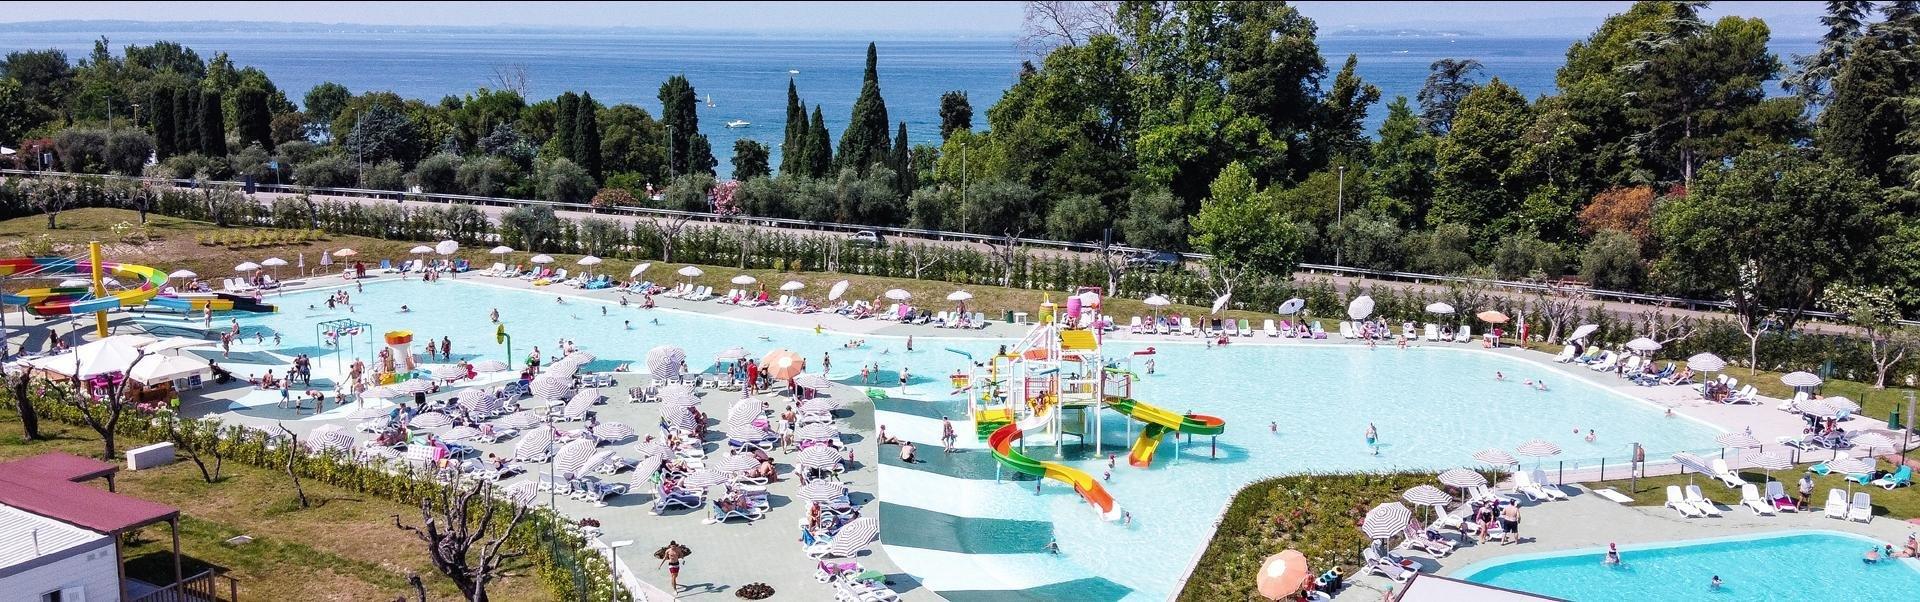 Banner Cisano San Vito - Zwembad 2021